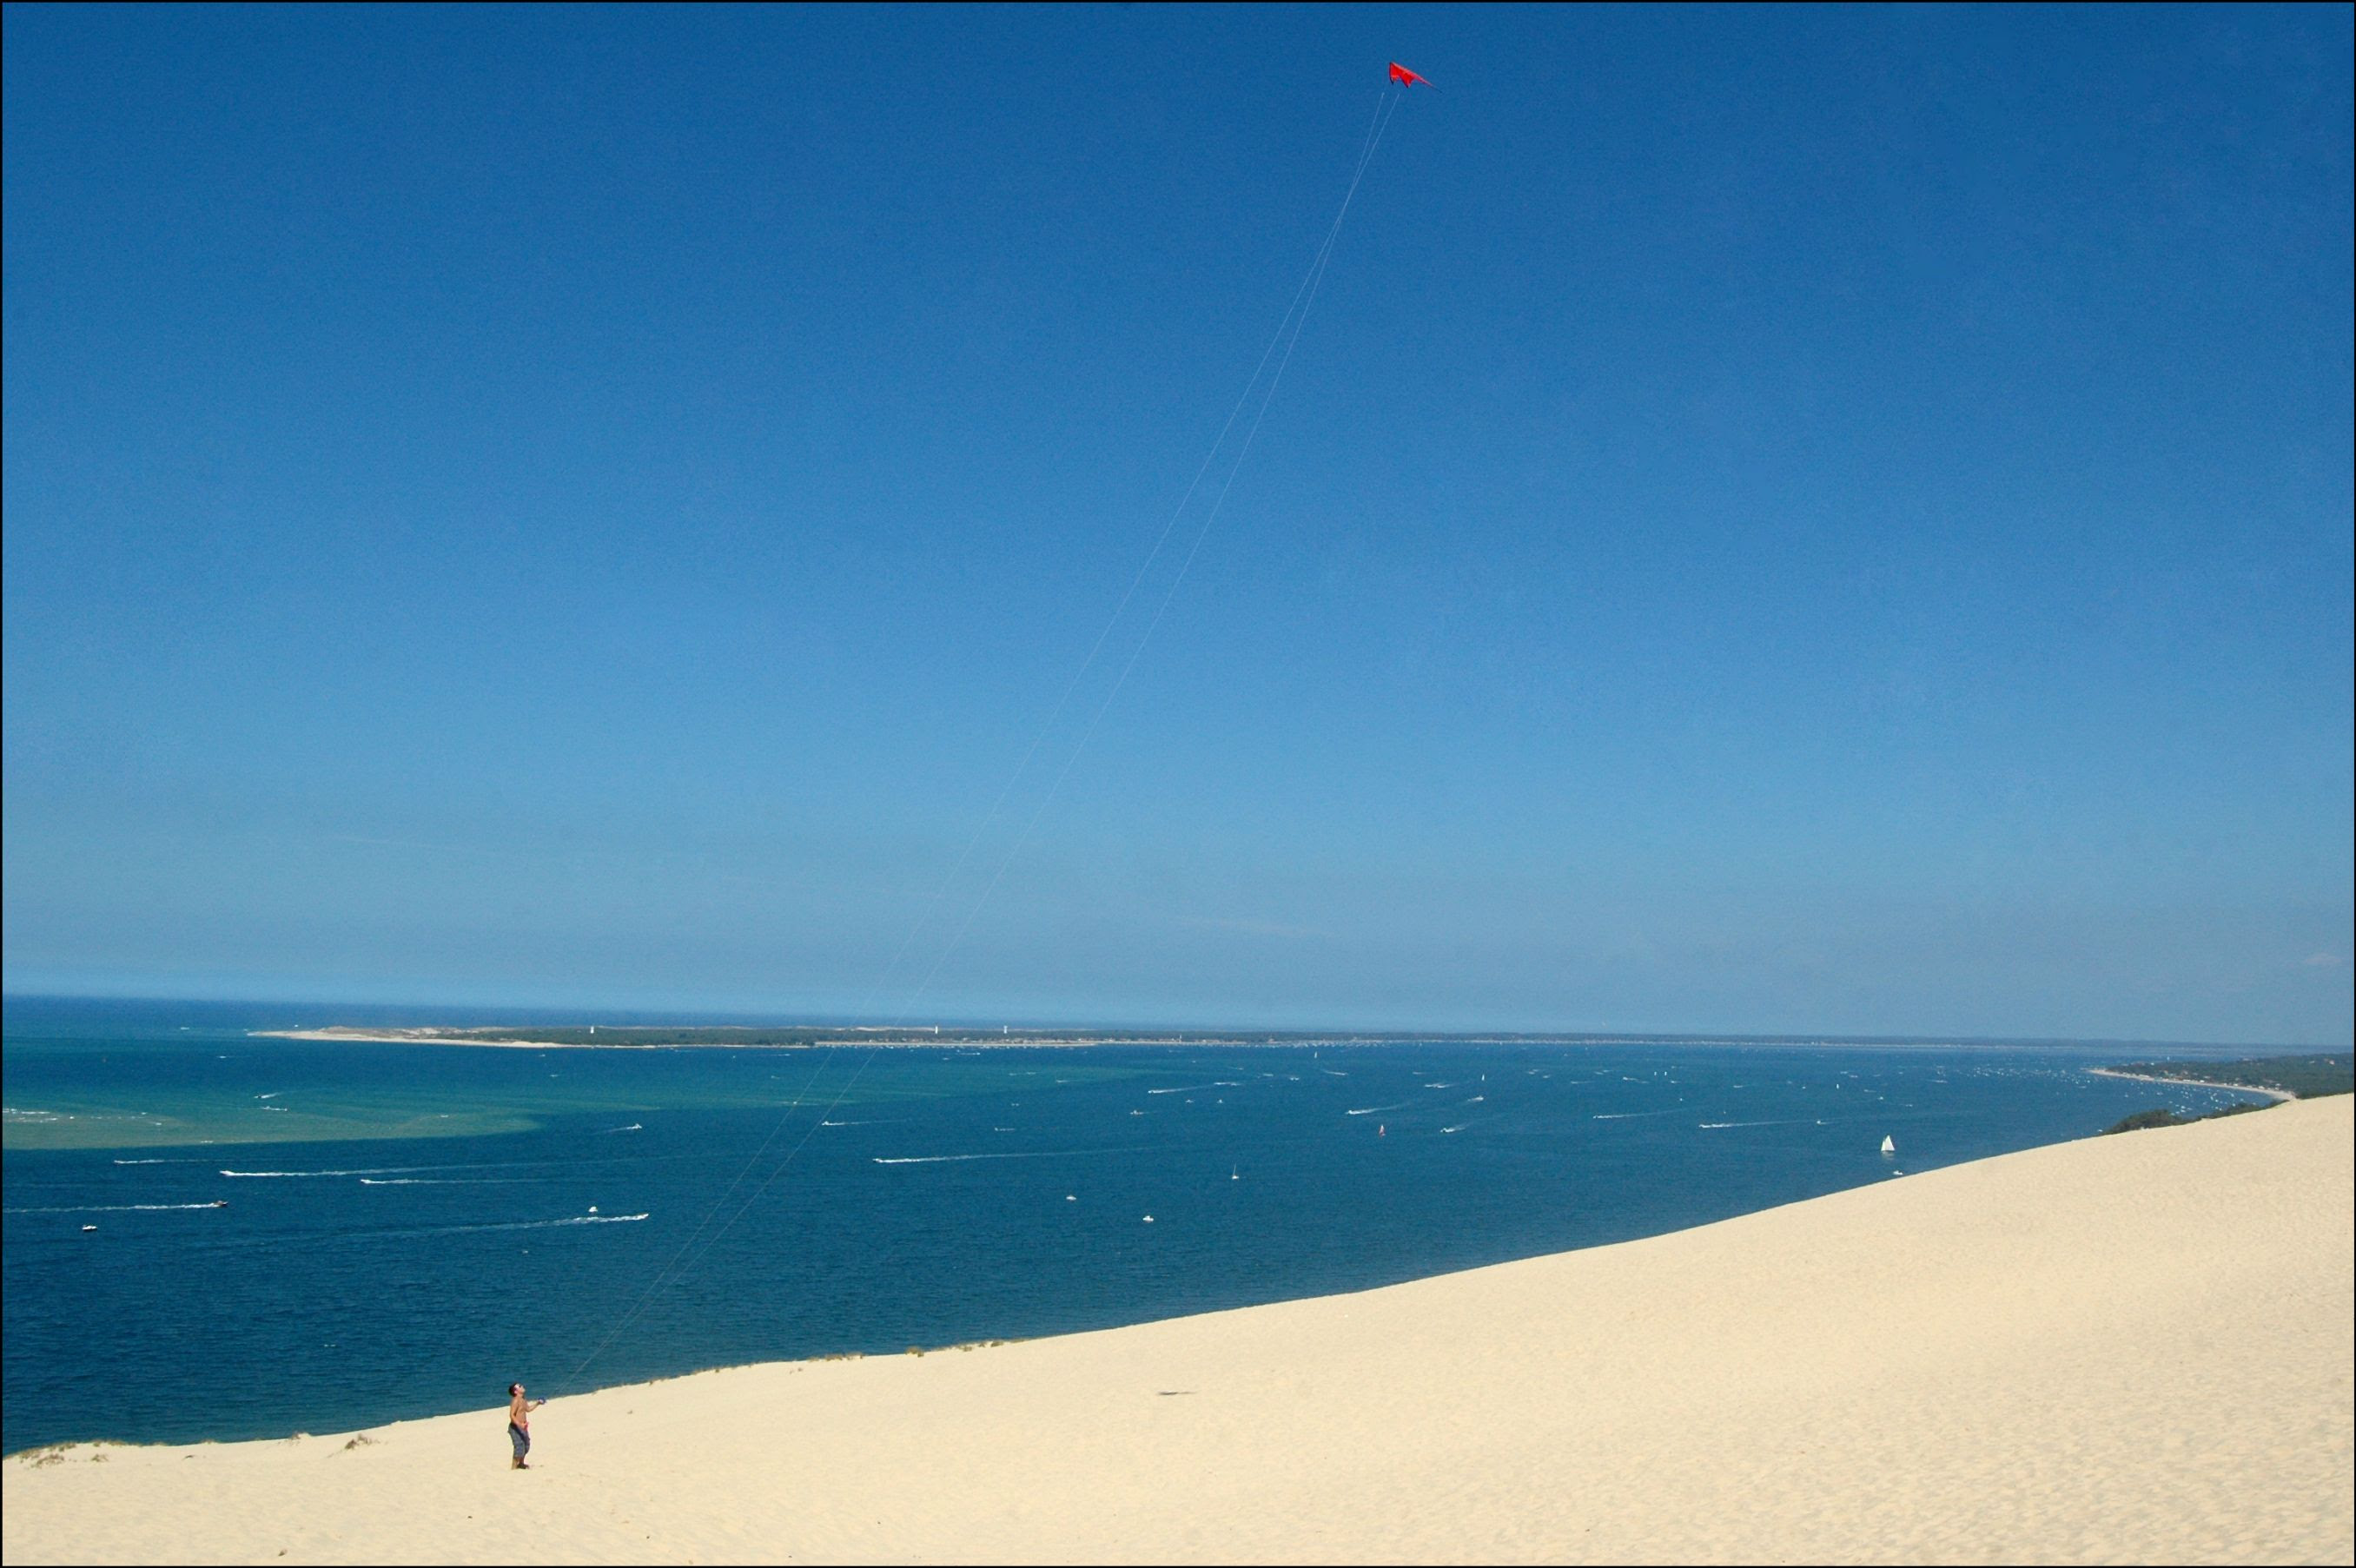 hxJ0O Dune de Pyla   A new Sahara desert being born   in France! [30 pics]